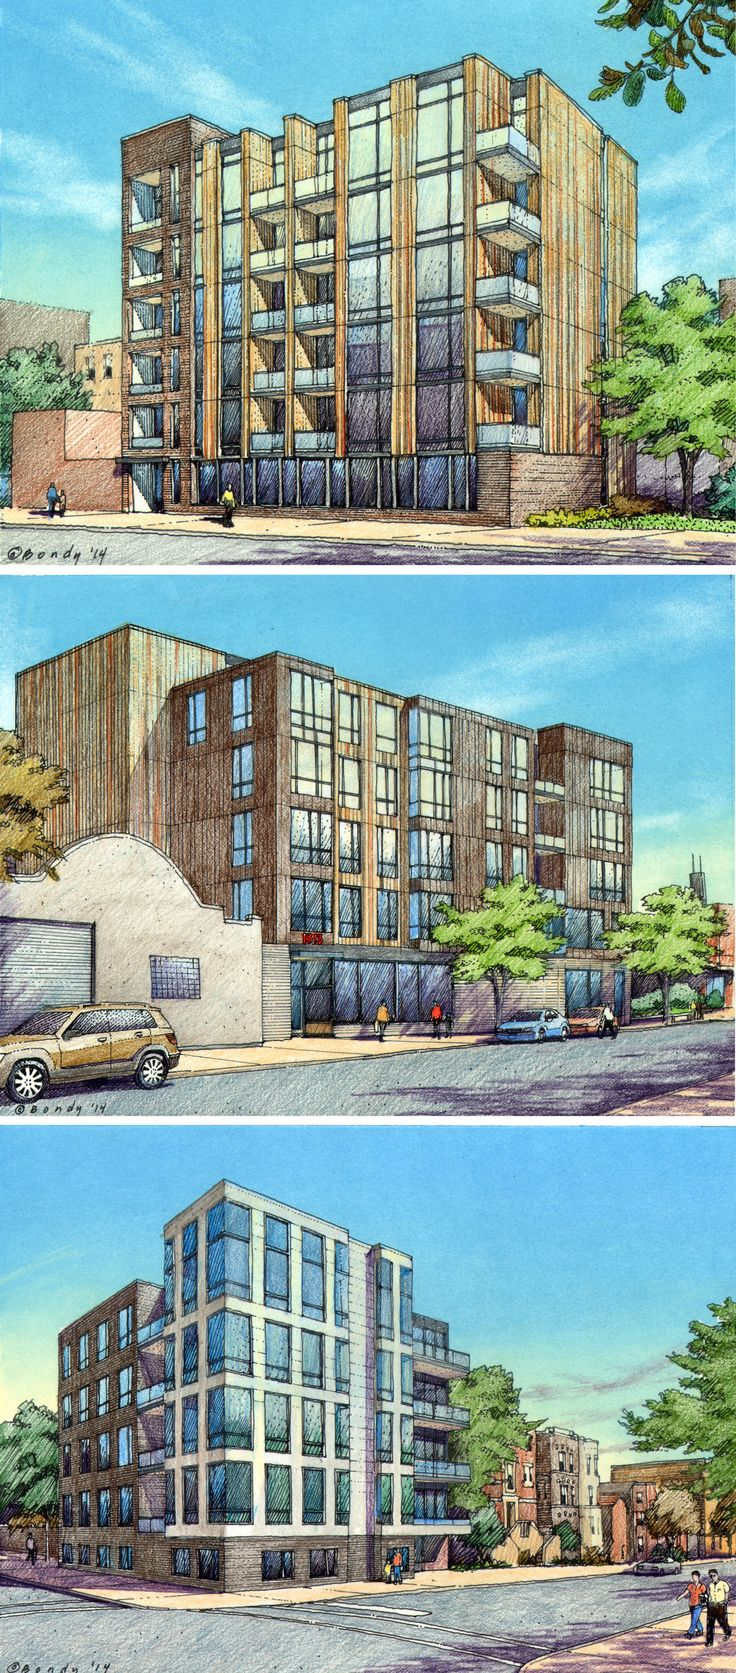 FitzGerald Associates.  3 Chicago sites.  12 hour charrette.  Drawings by Bruce Bondy, Bondy Studio.